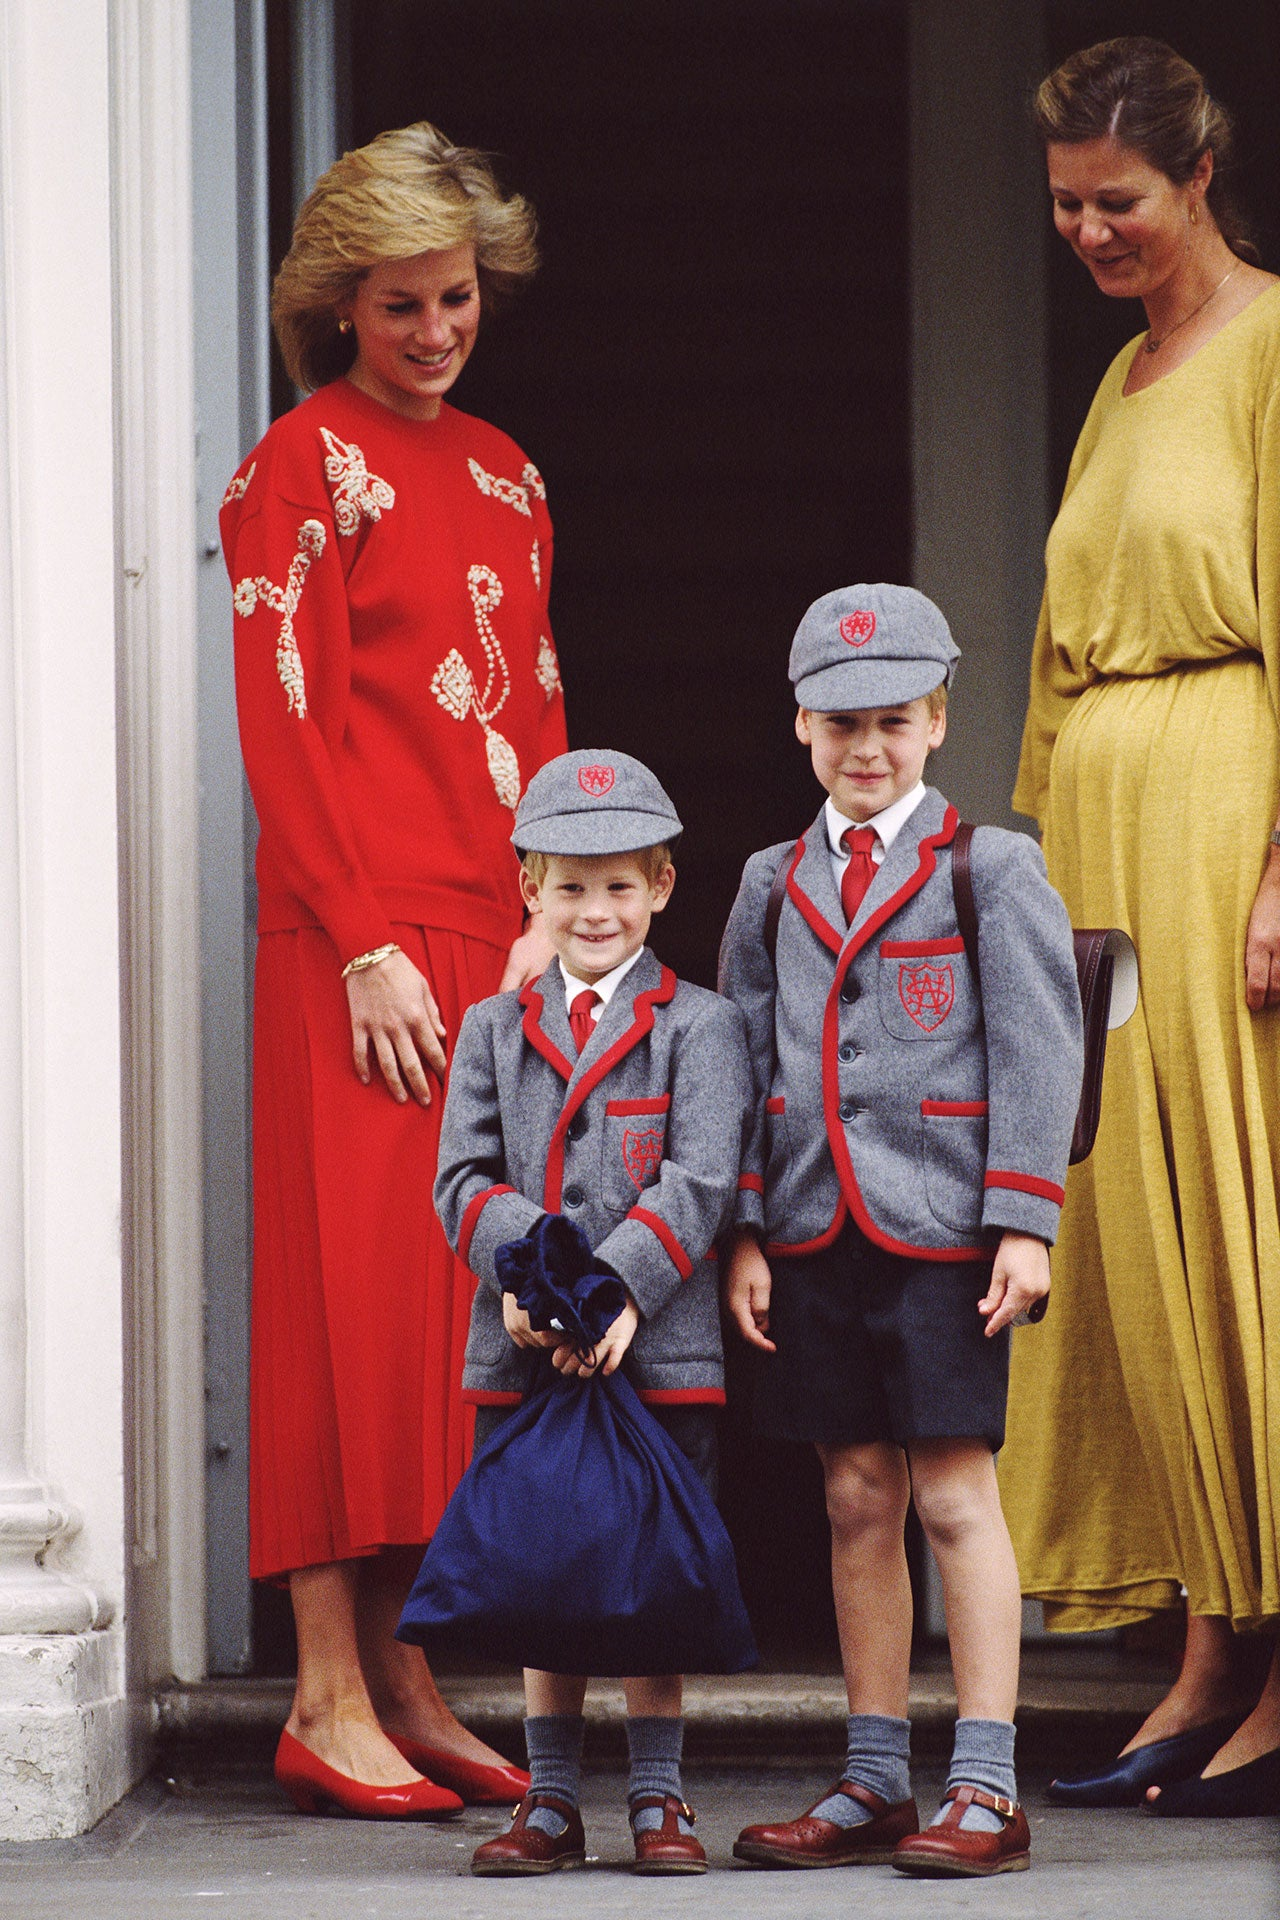 Princezna Diana se syny princem Harrym (vlevo) a princem Williamem, září 1989 Autor: Terry Fincher/Princess Diana Archive/Getty Images